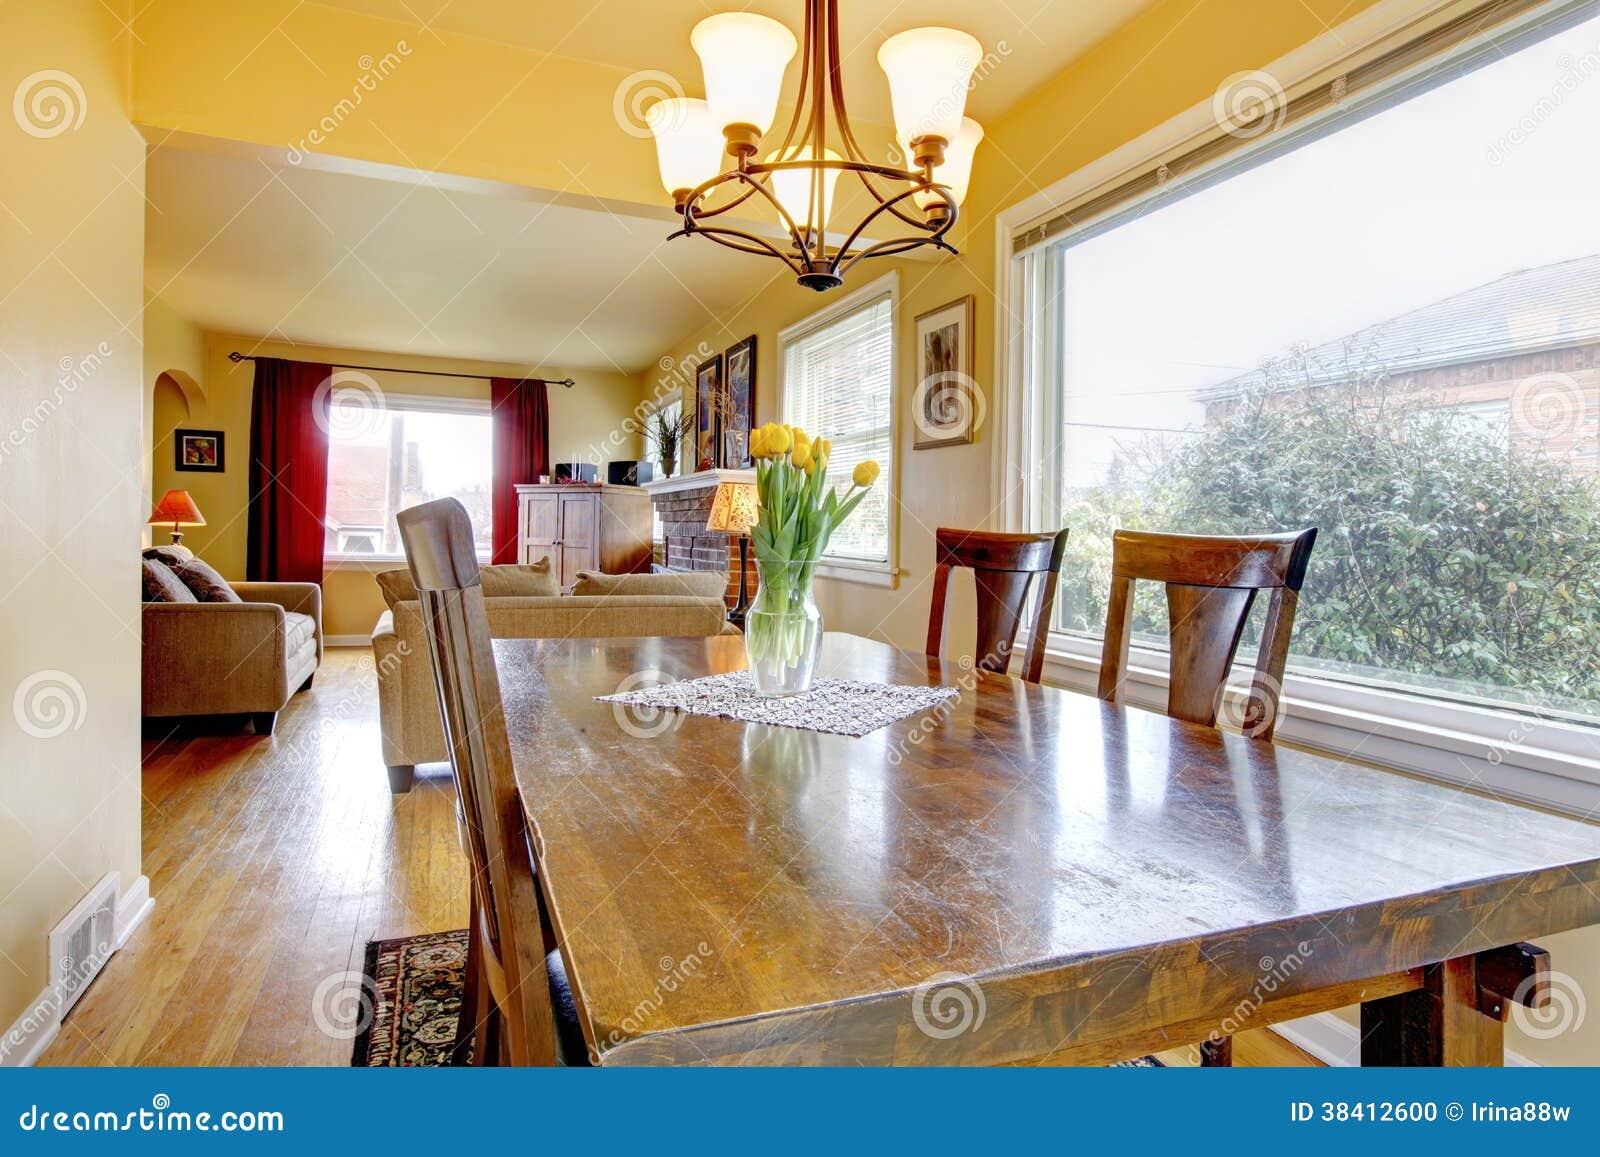 Peque o comedor acogedor vista de la sala de estar foto for Mesa de comedor en la sala de estar